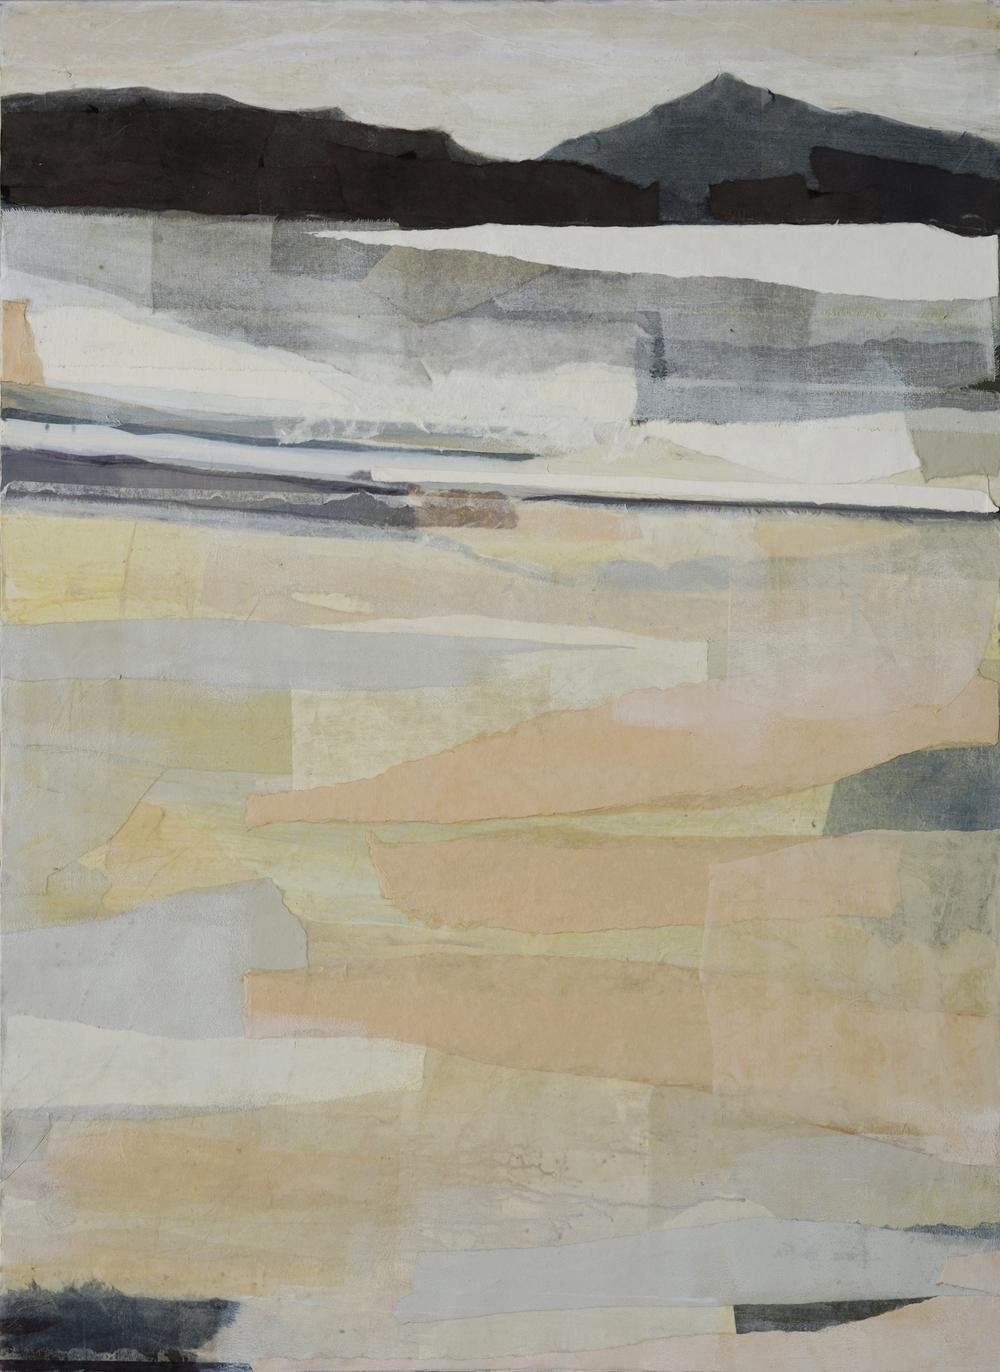 Stinson 1: 40 x 30 2016 (sold)